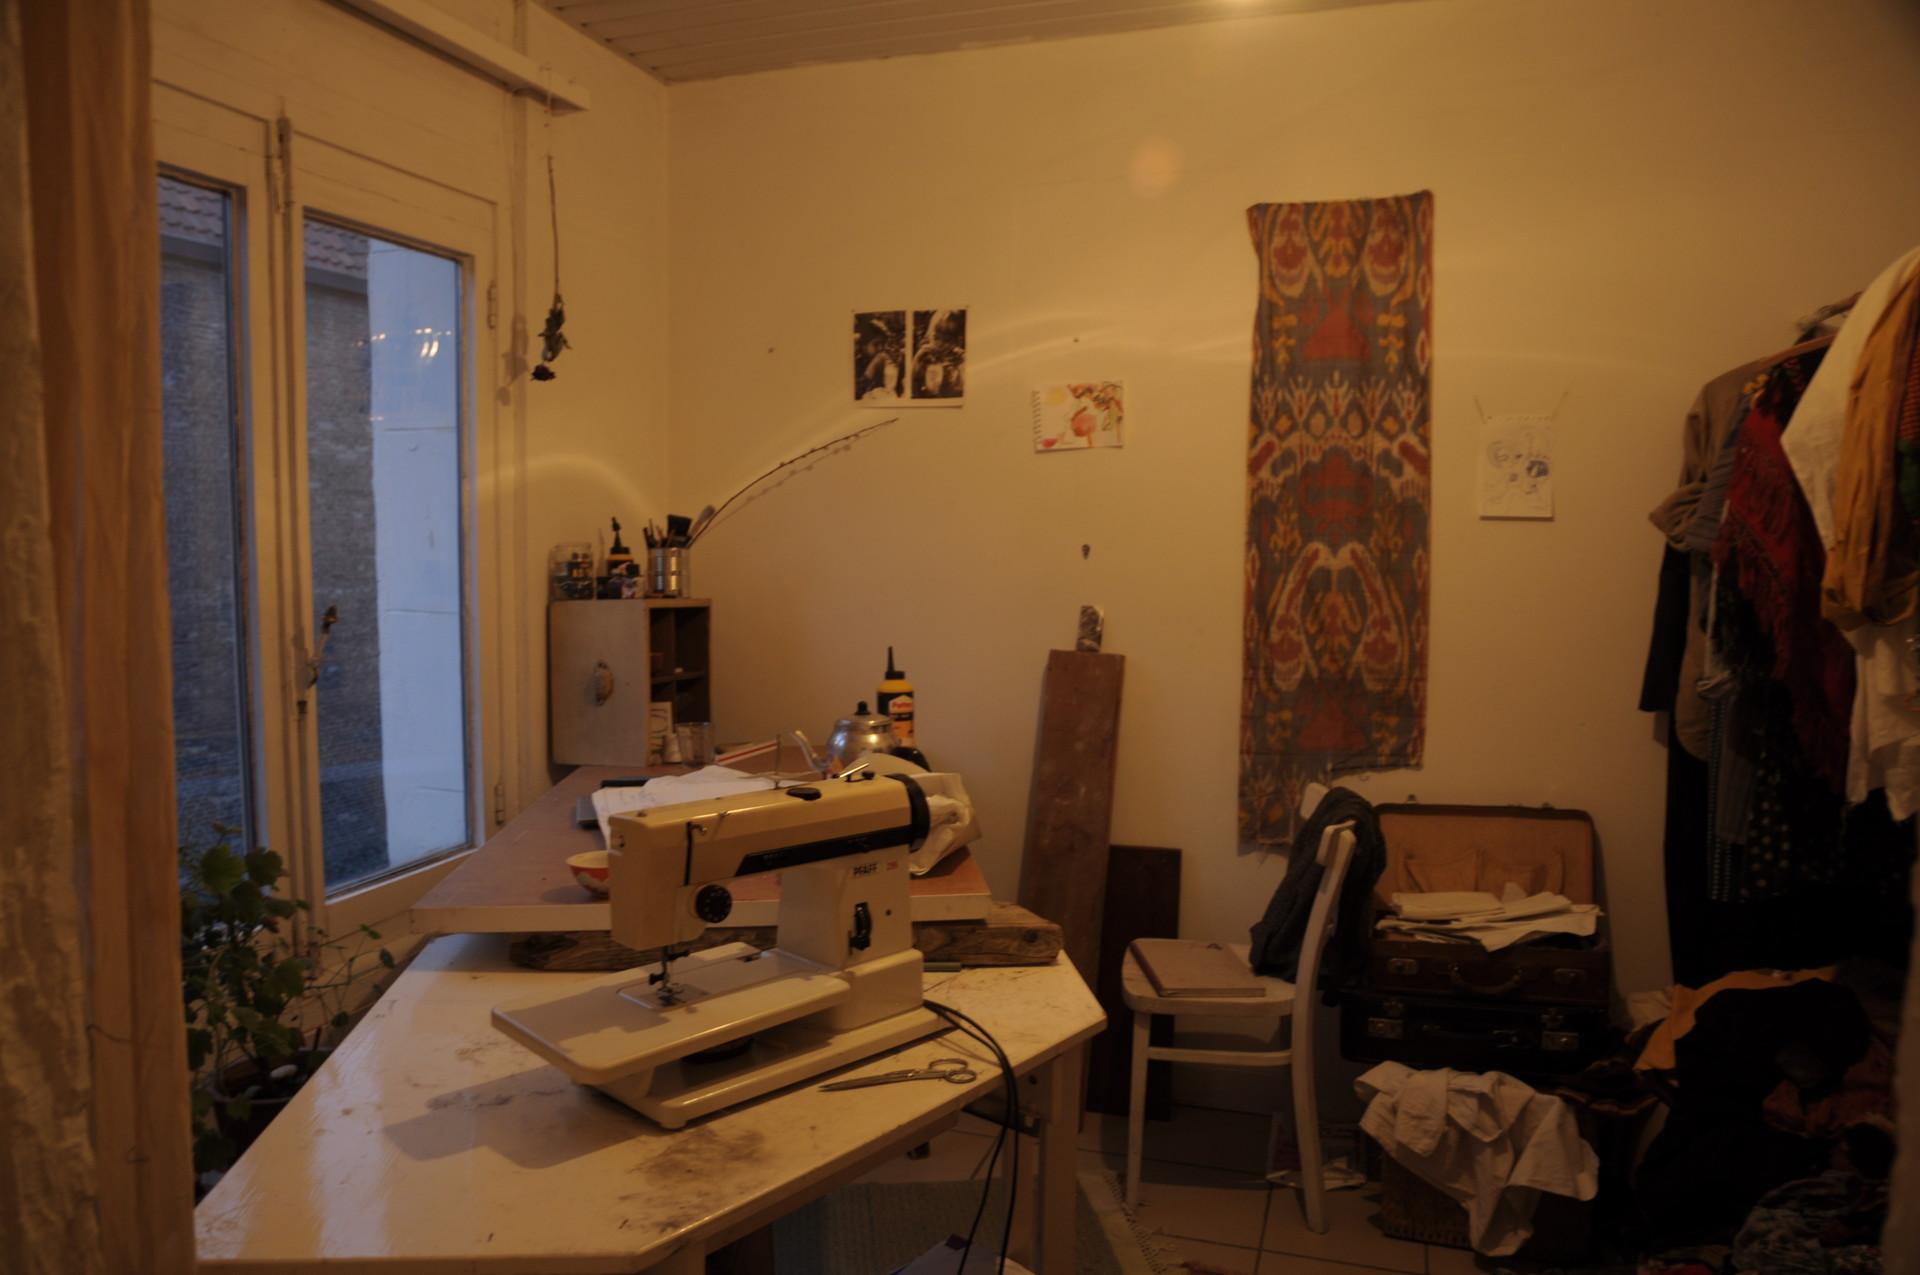 light-spaced-student-studio-centre-263da0ee8a357906464c48c7a3ed38b7